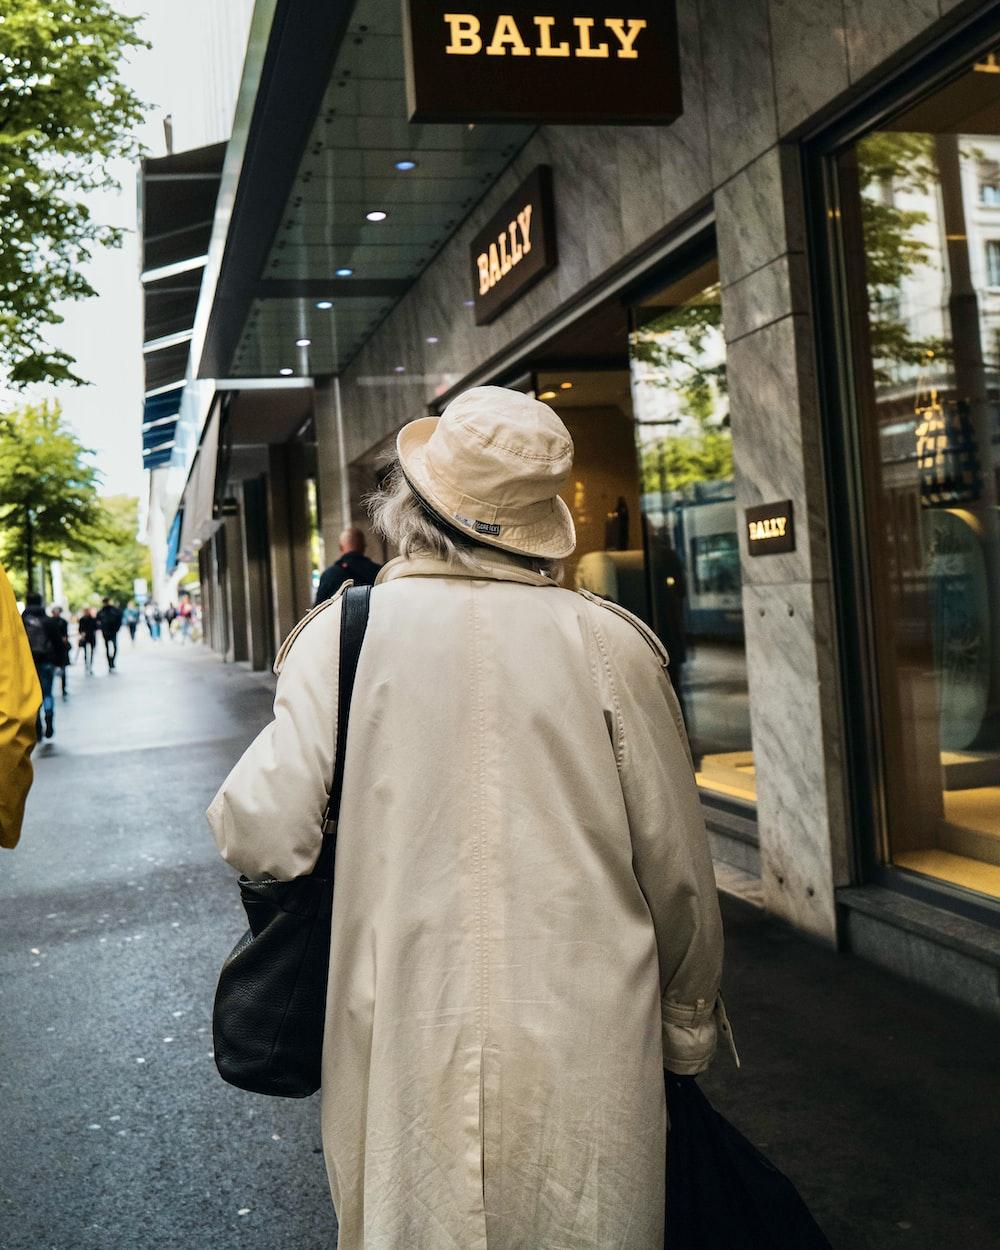 man in beige jacket walking on sidewalk during daytime